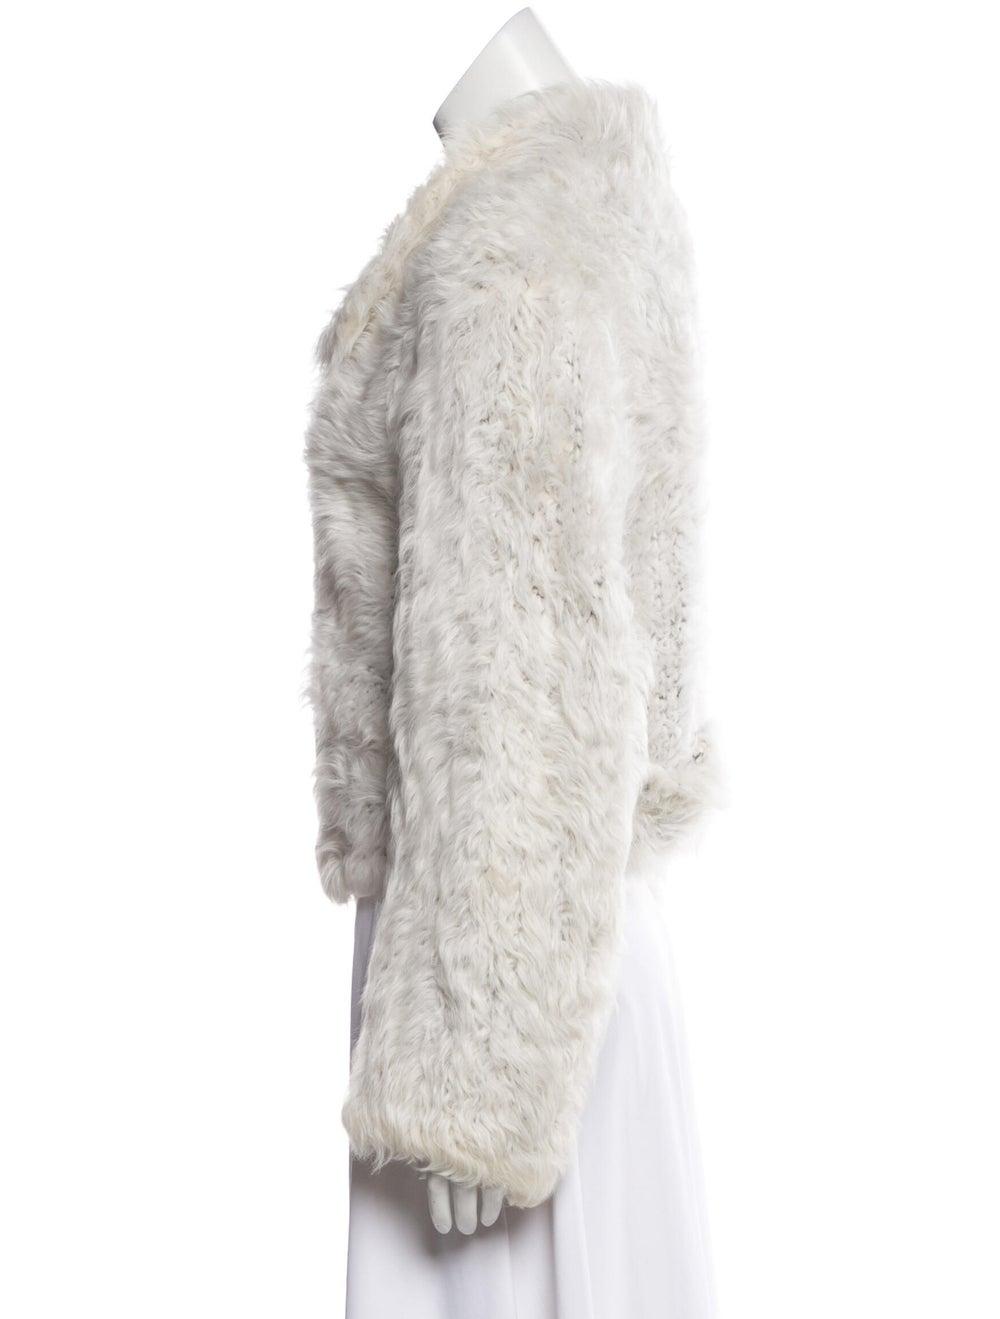 Yves Saint Laurent Shearling Collared Jacket - image 2